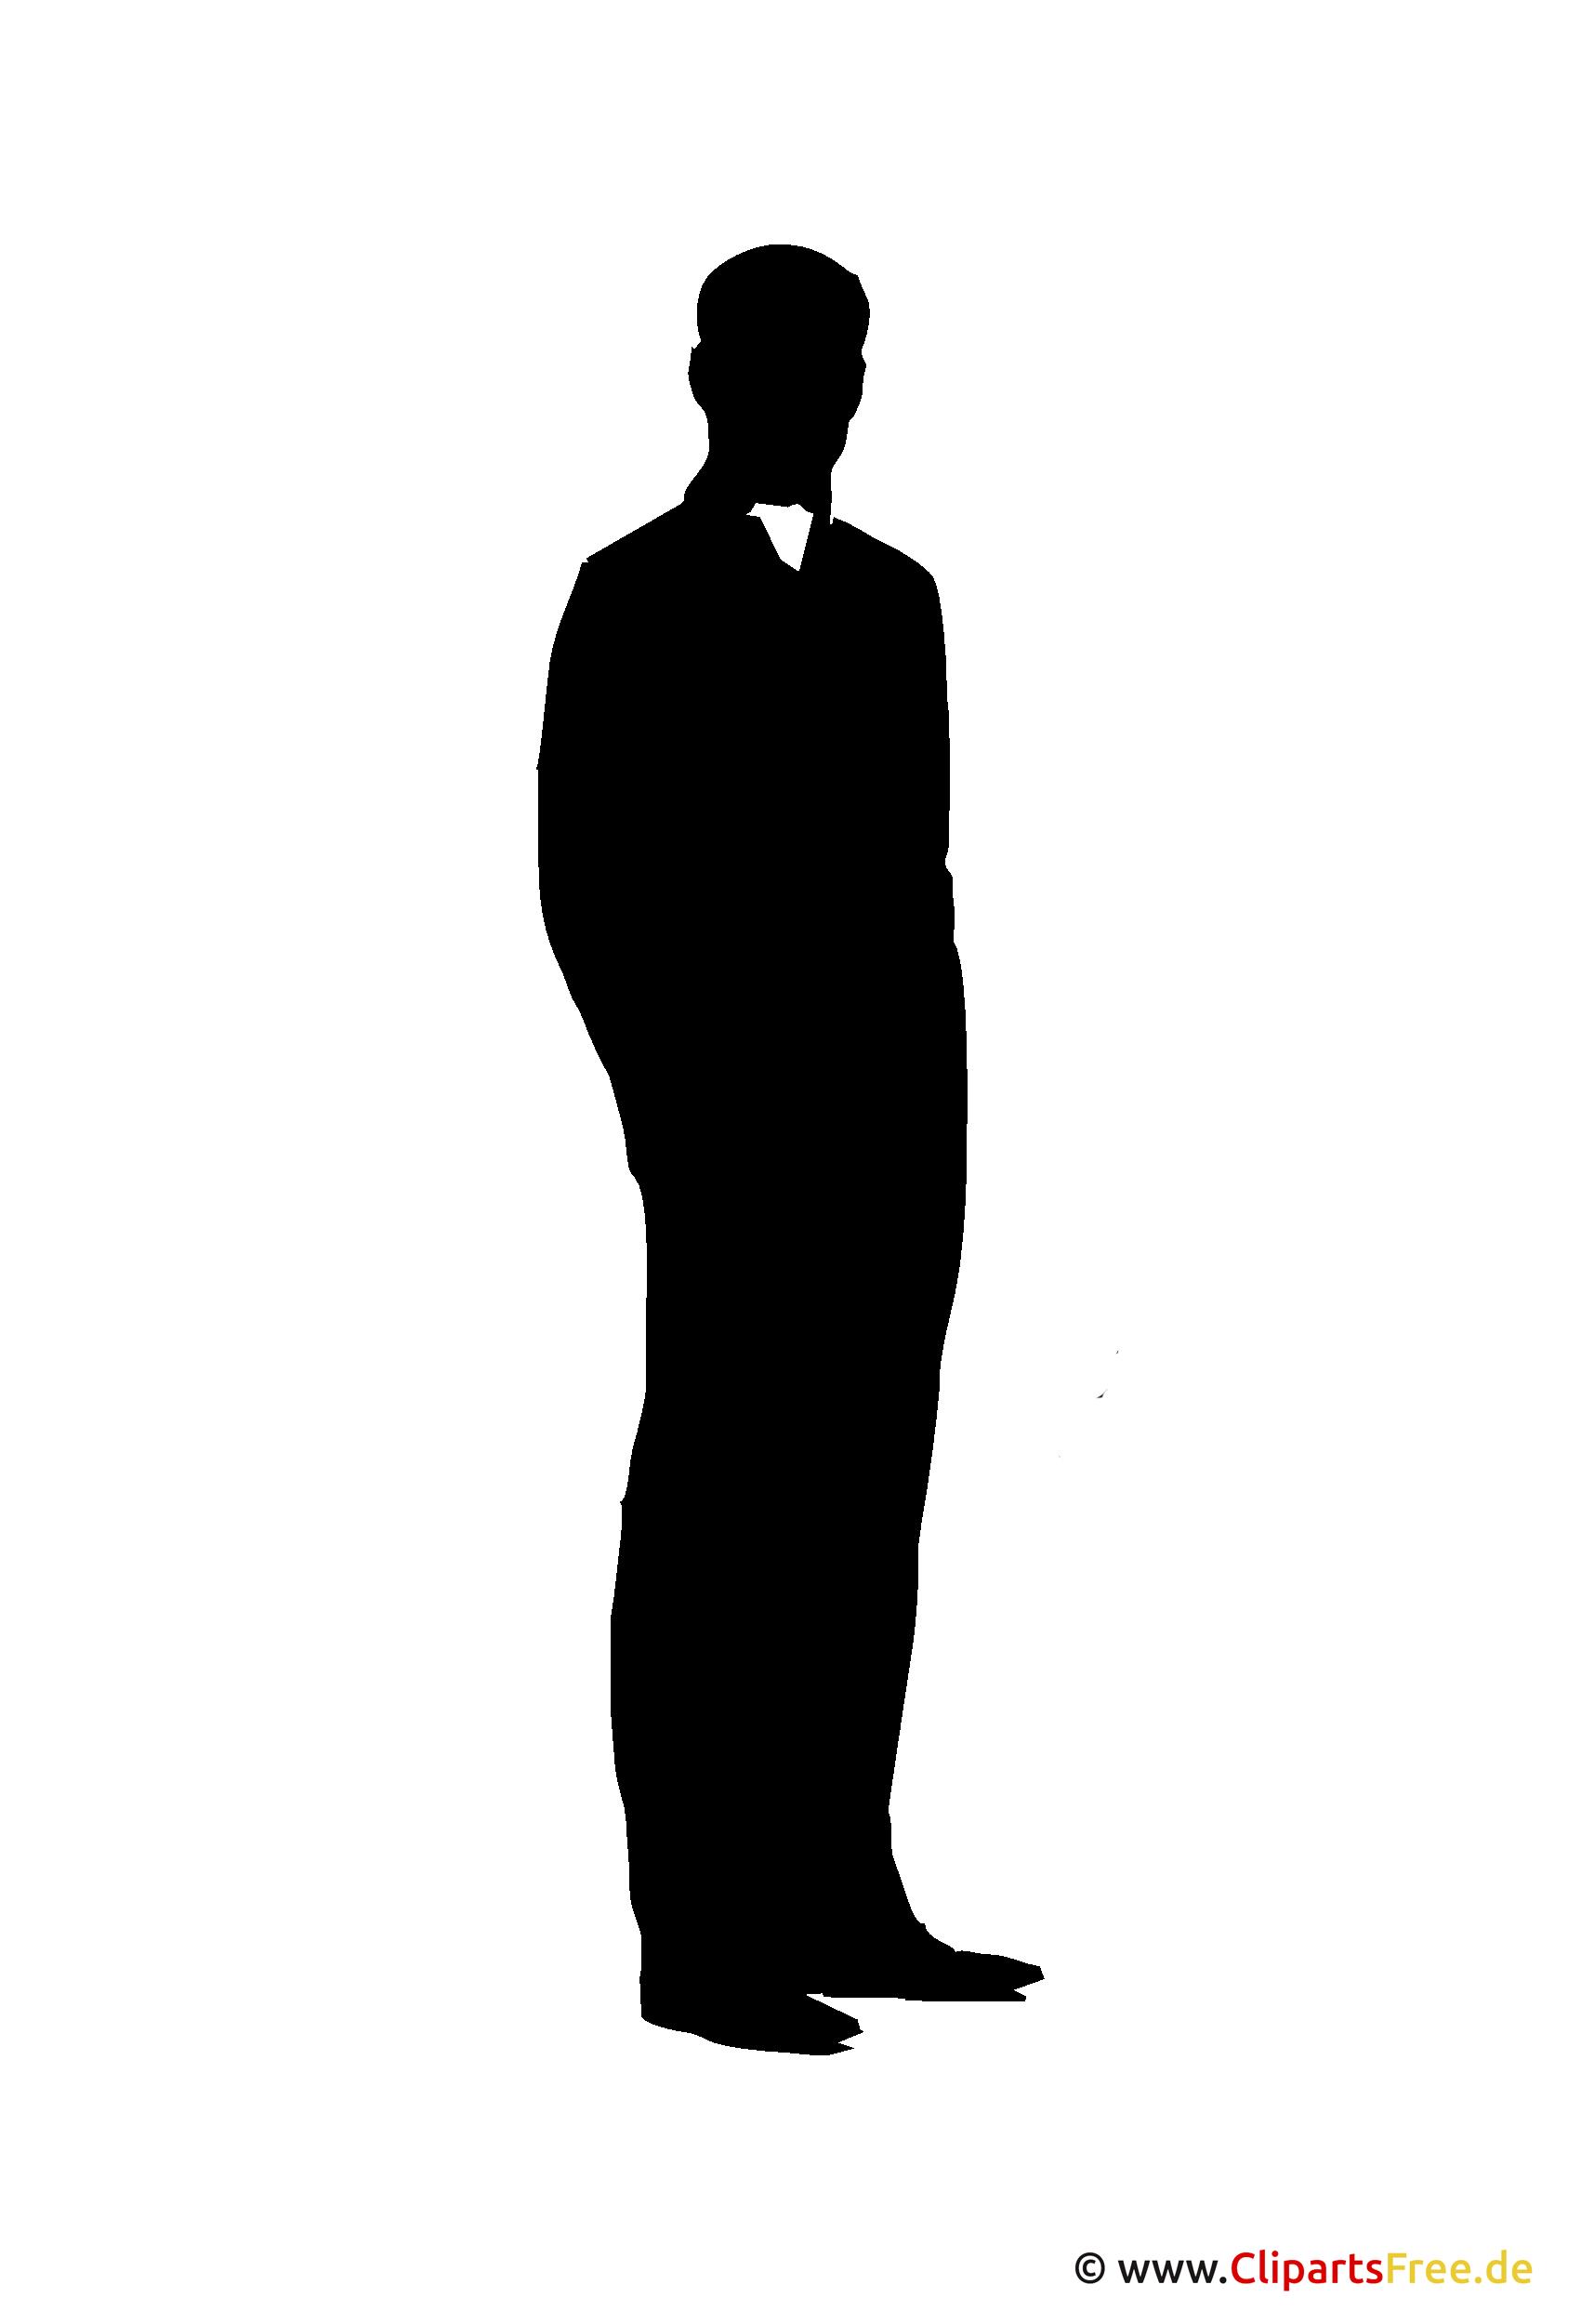 Silhouette Mann im Anzug stehend